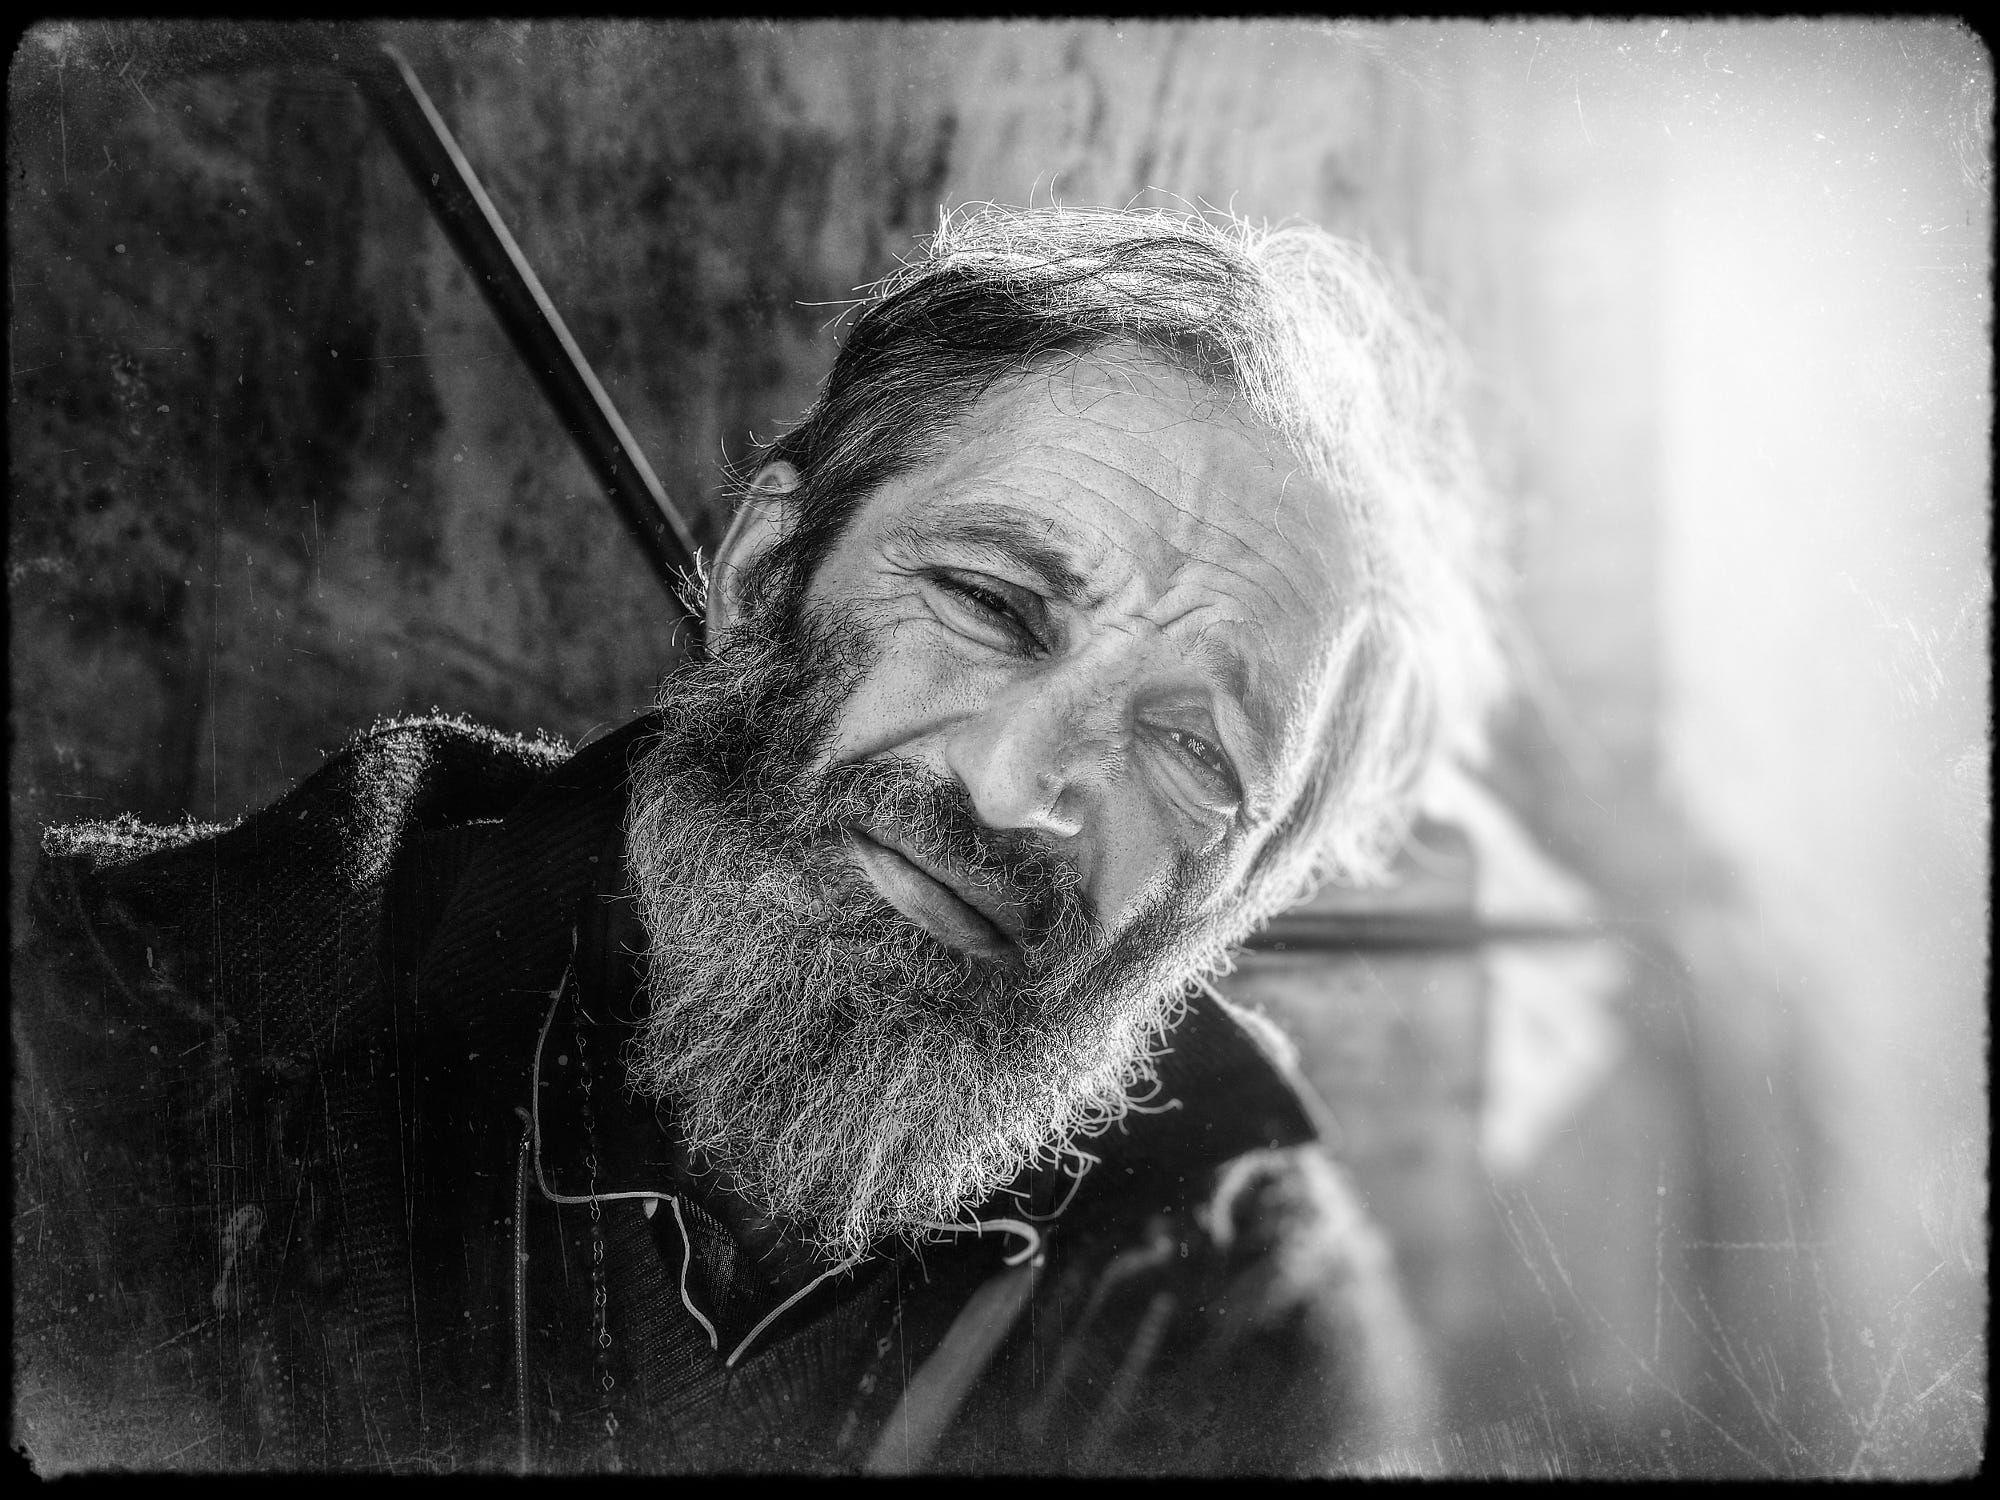 Homeless   by Edmondo Senatore on 500px   People   World photography